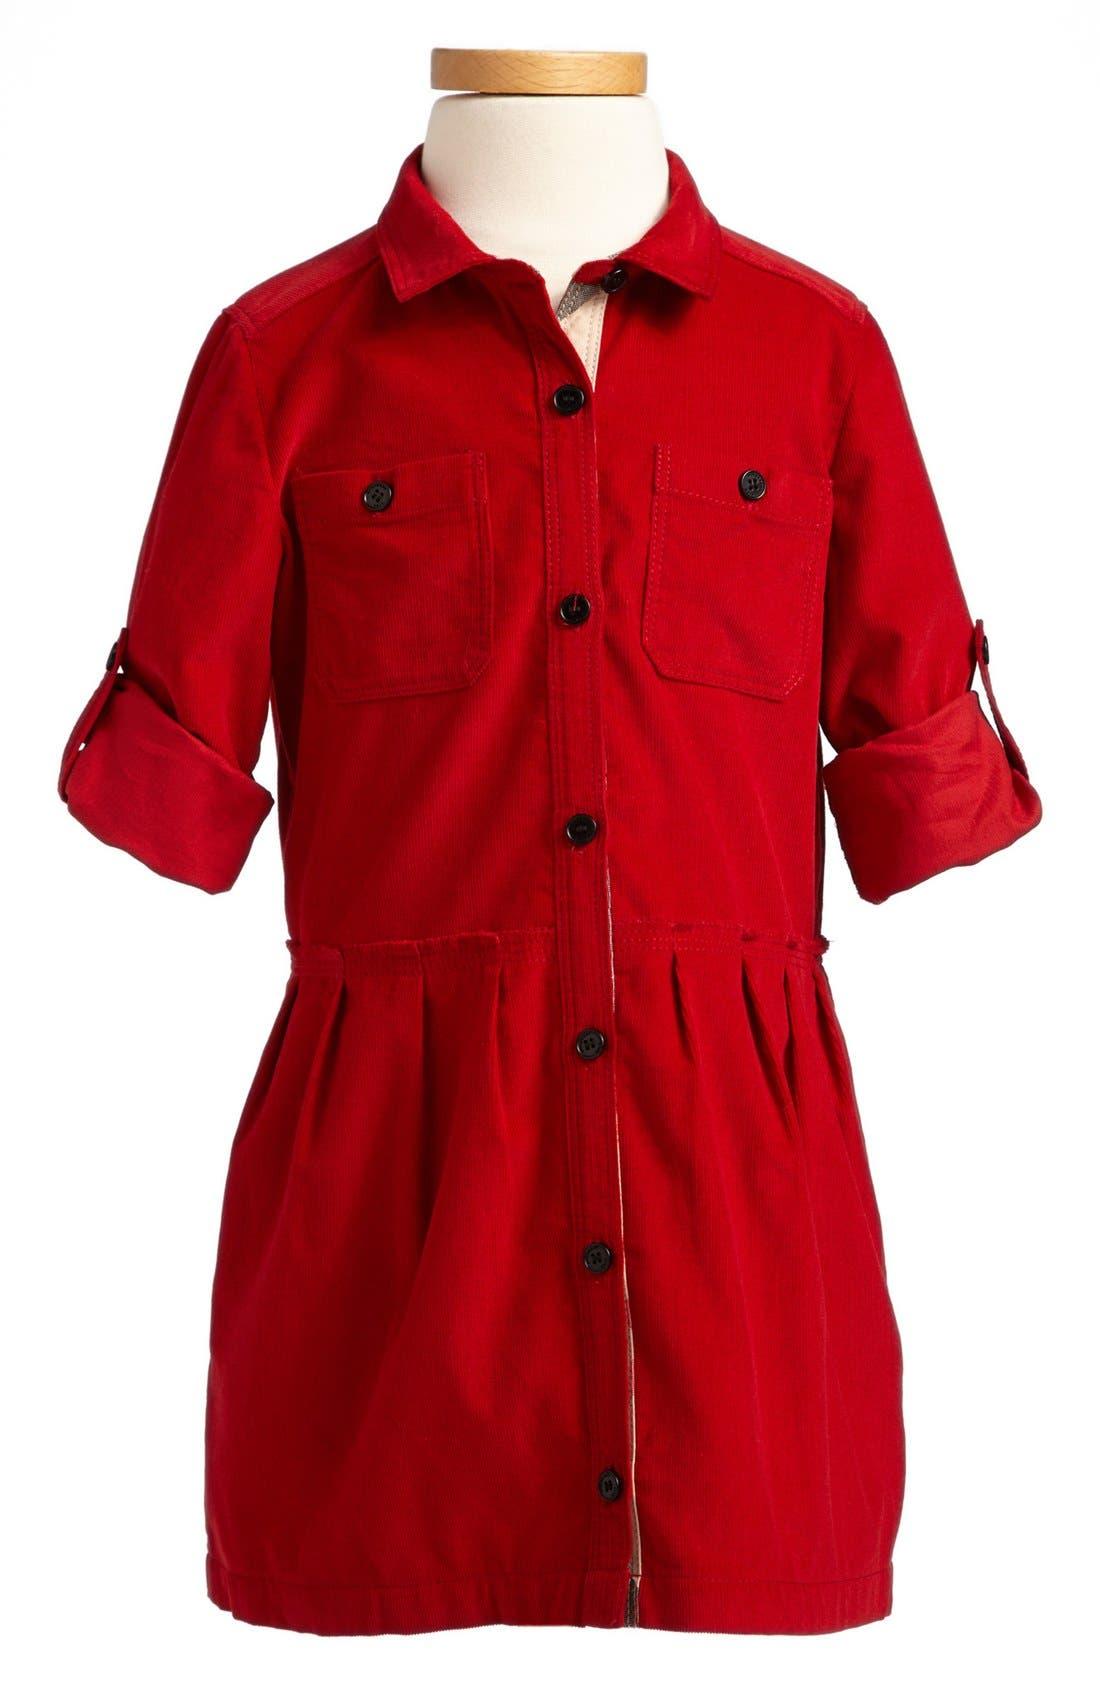 Alternate Image 1 Selected - Burberry Corduroy Dress (Toddler Girls, Little Girls & Big Girls)